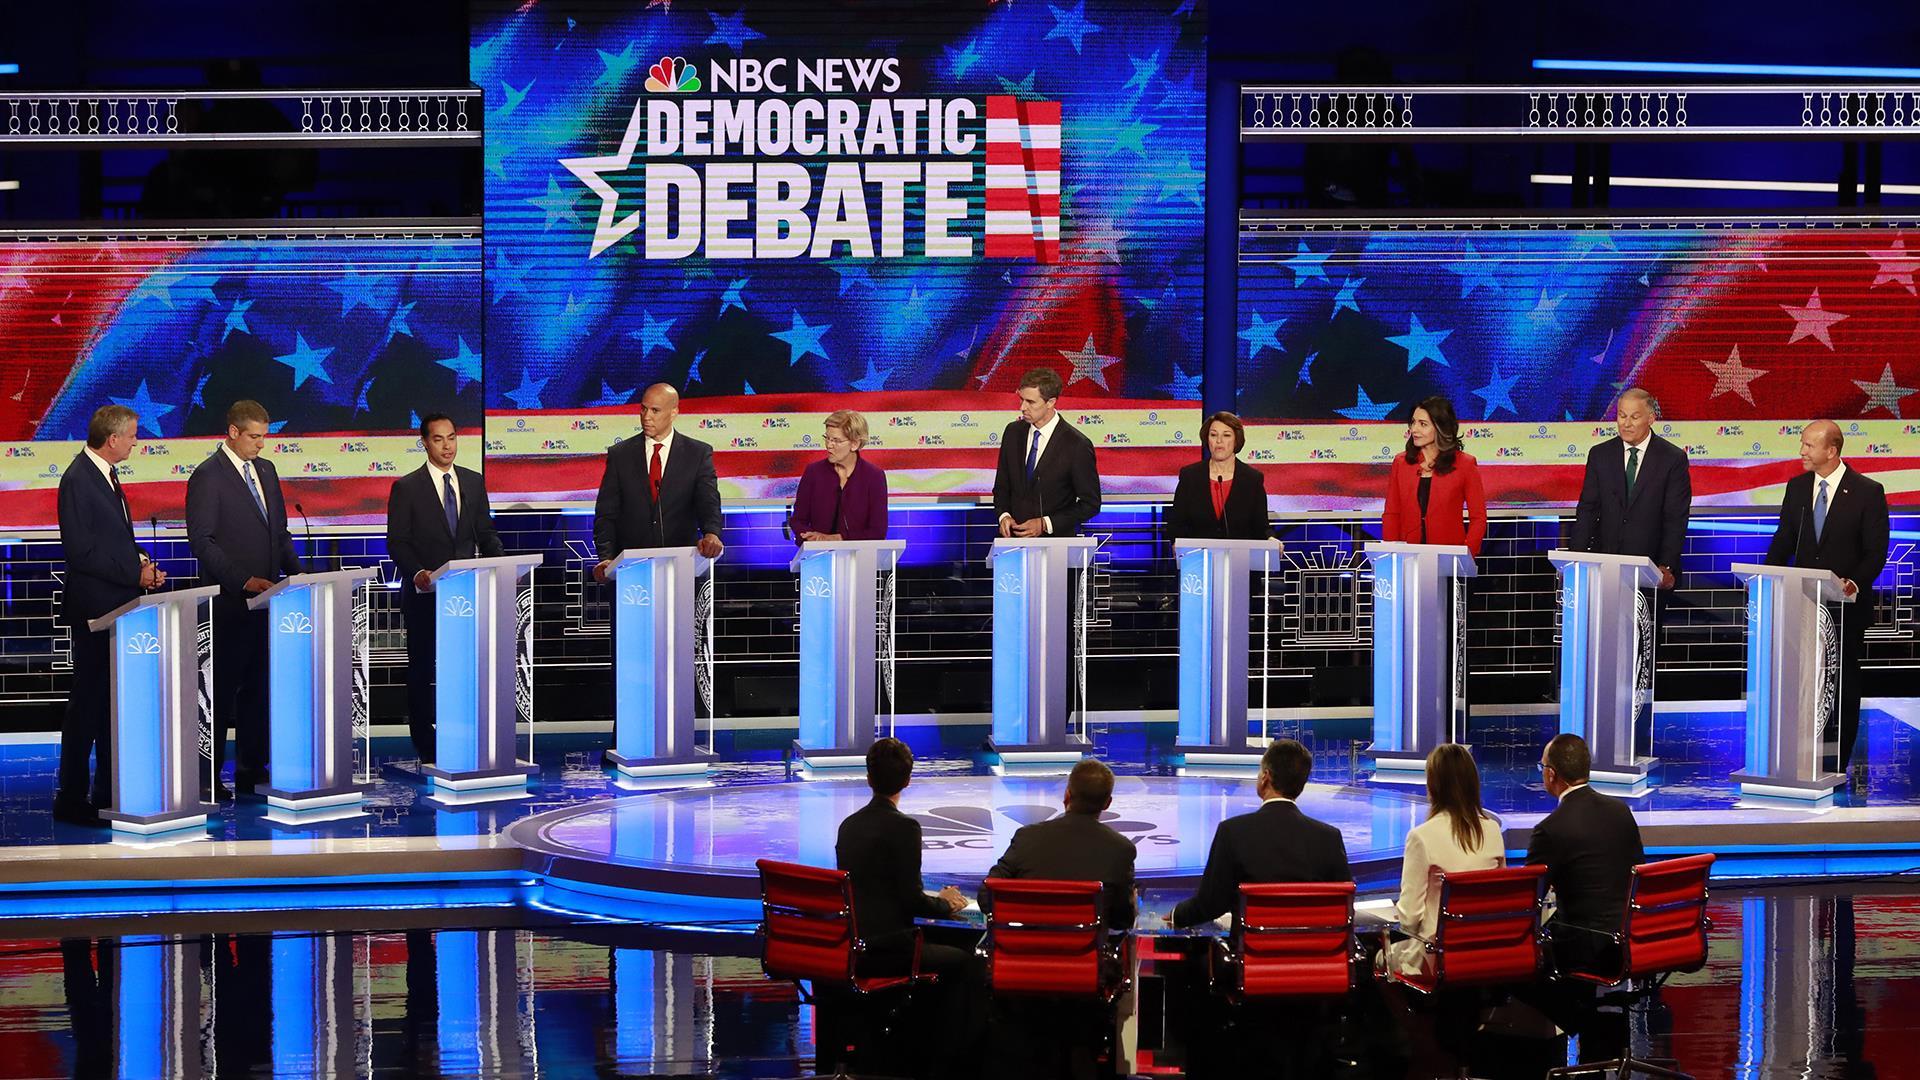 First Democratic debate highlights in under five minutes: Round 1